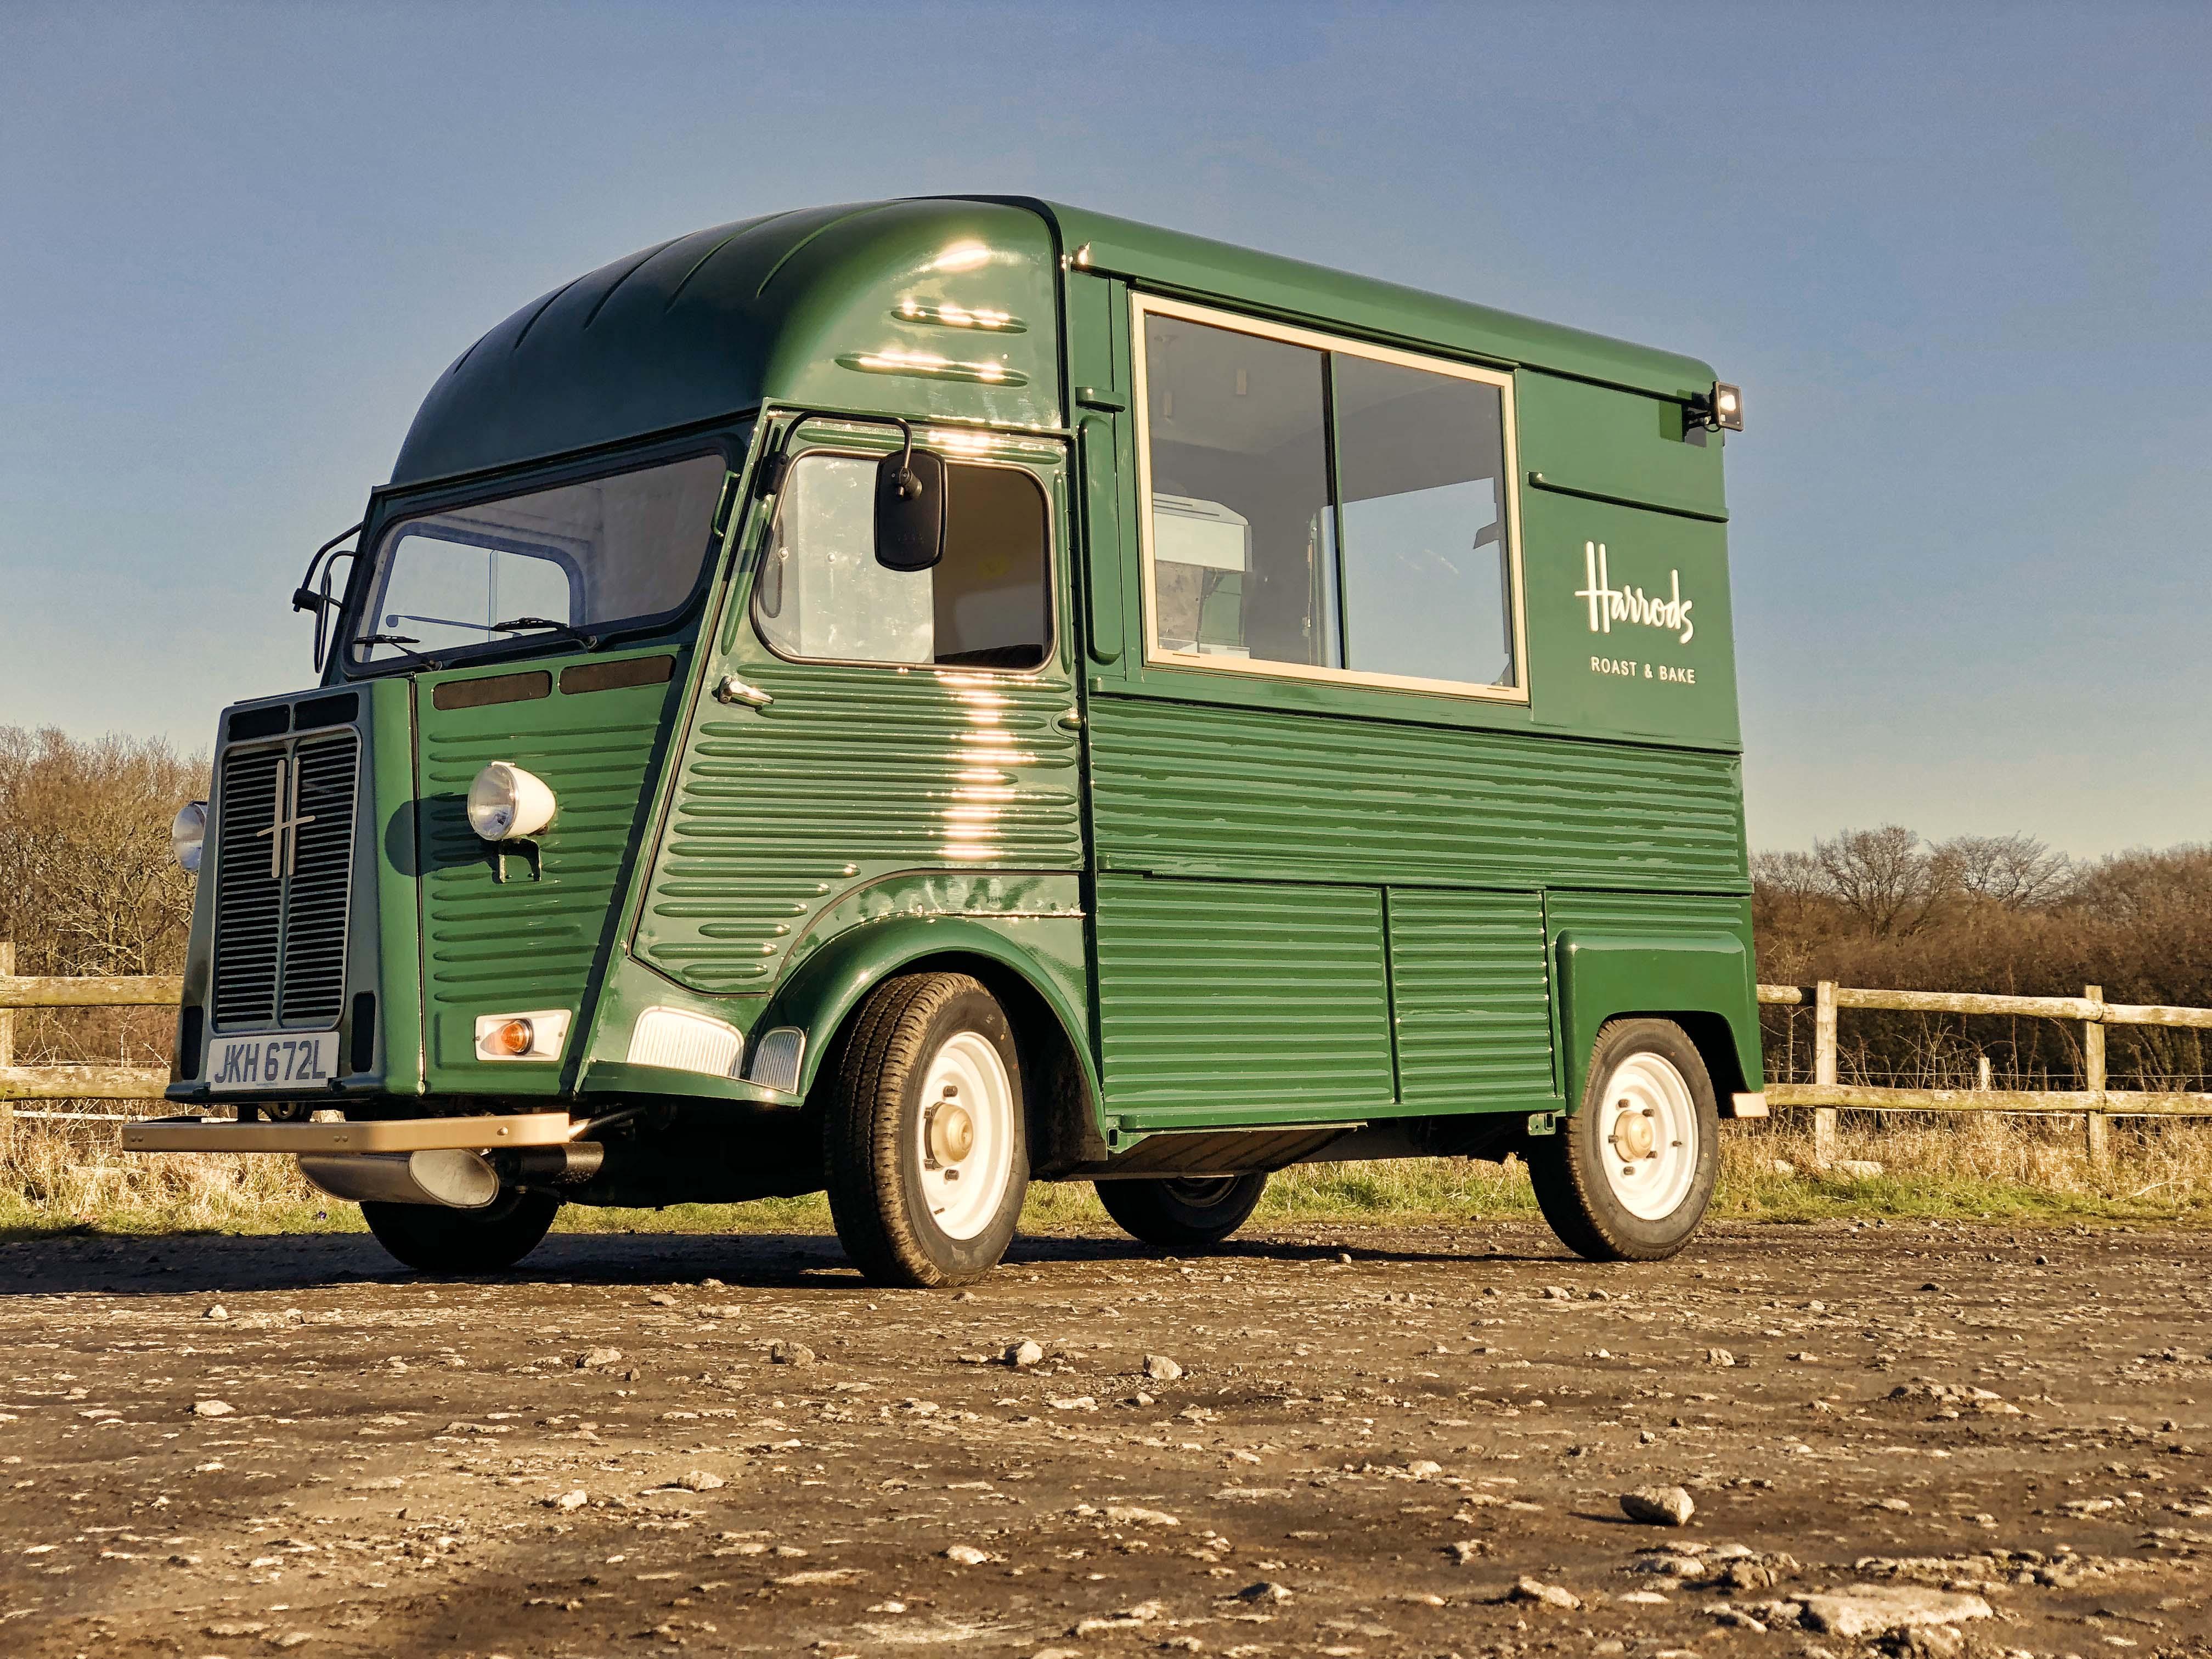 31e89c1dd1 Vintage Food Trucks - Food Trucks For Sale